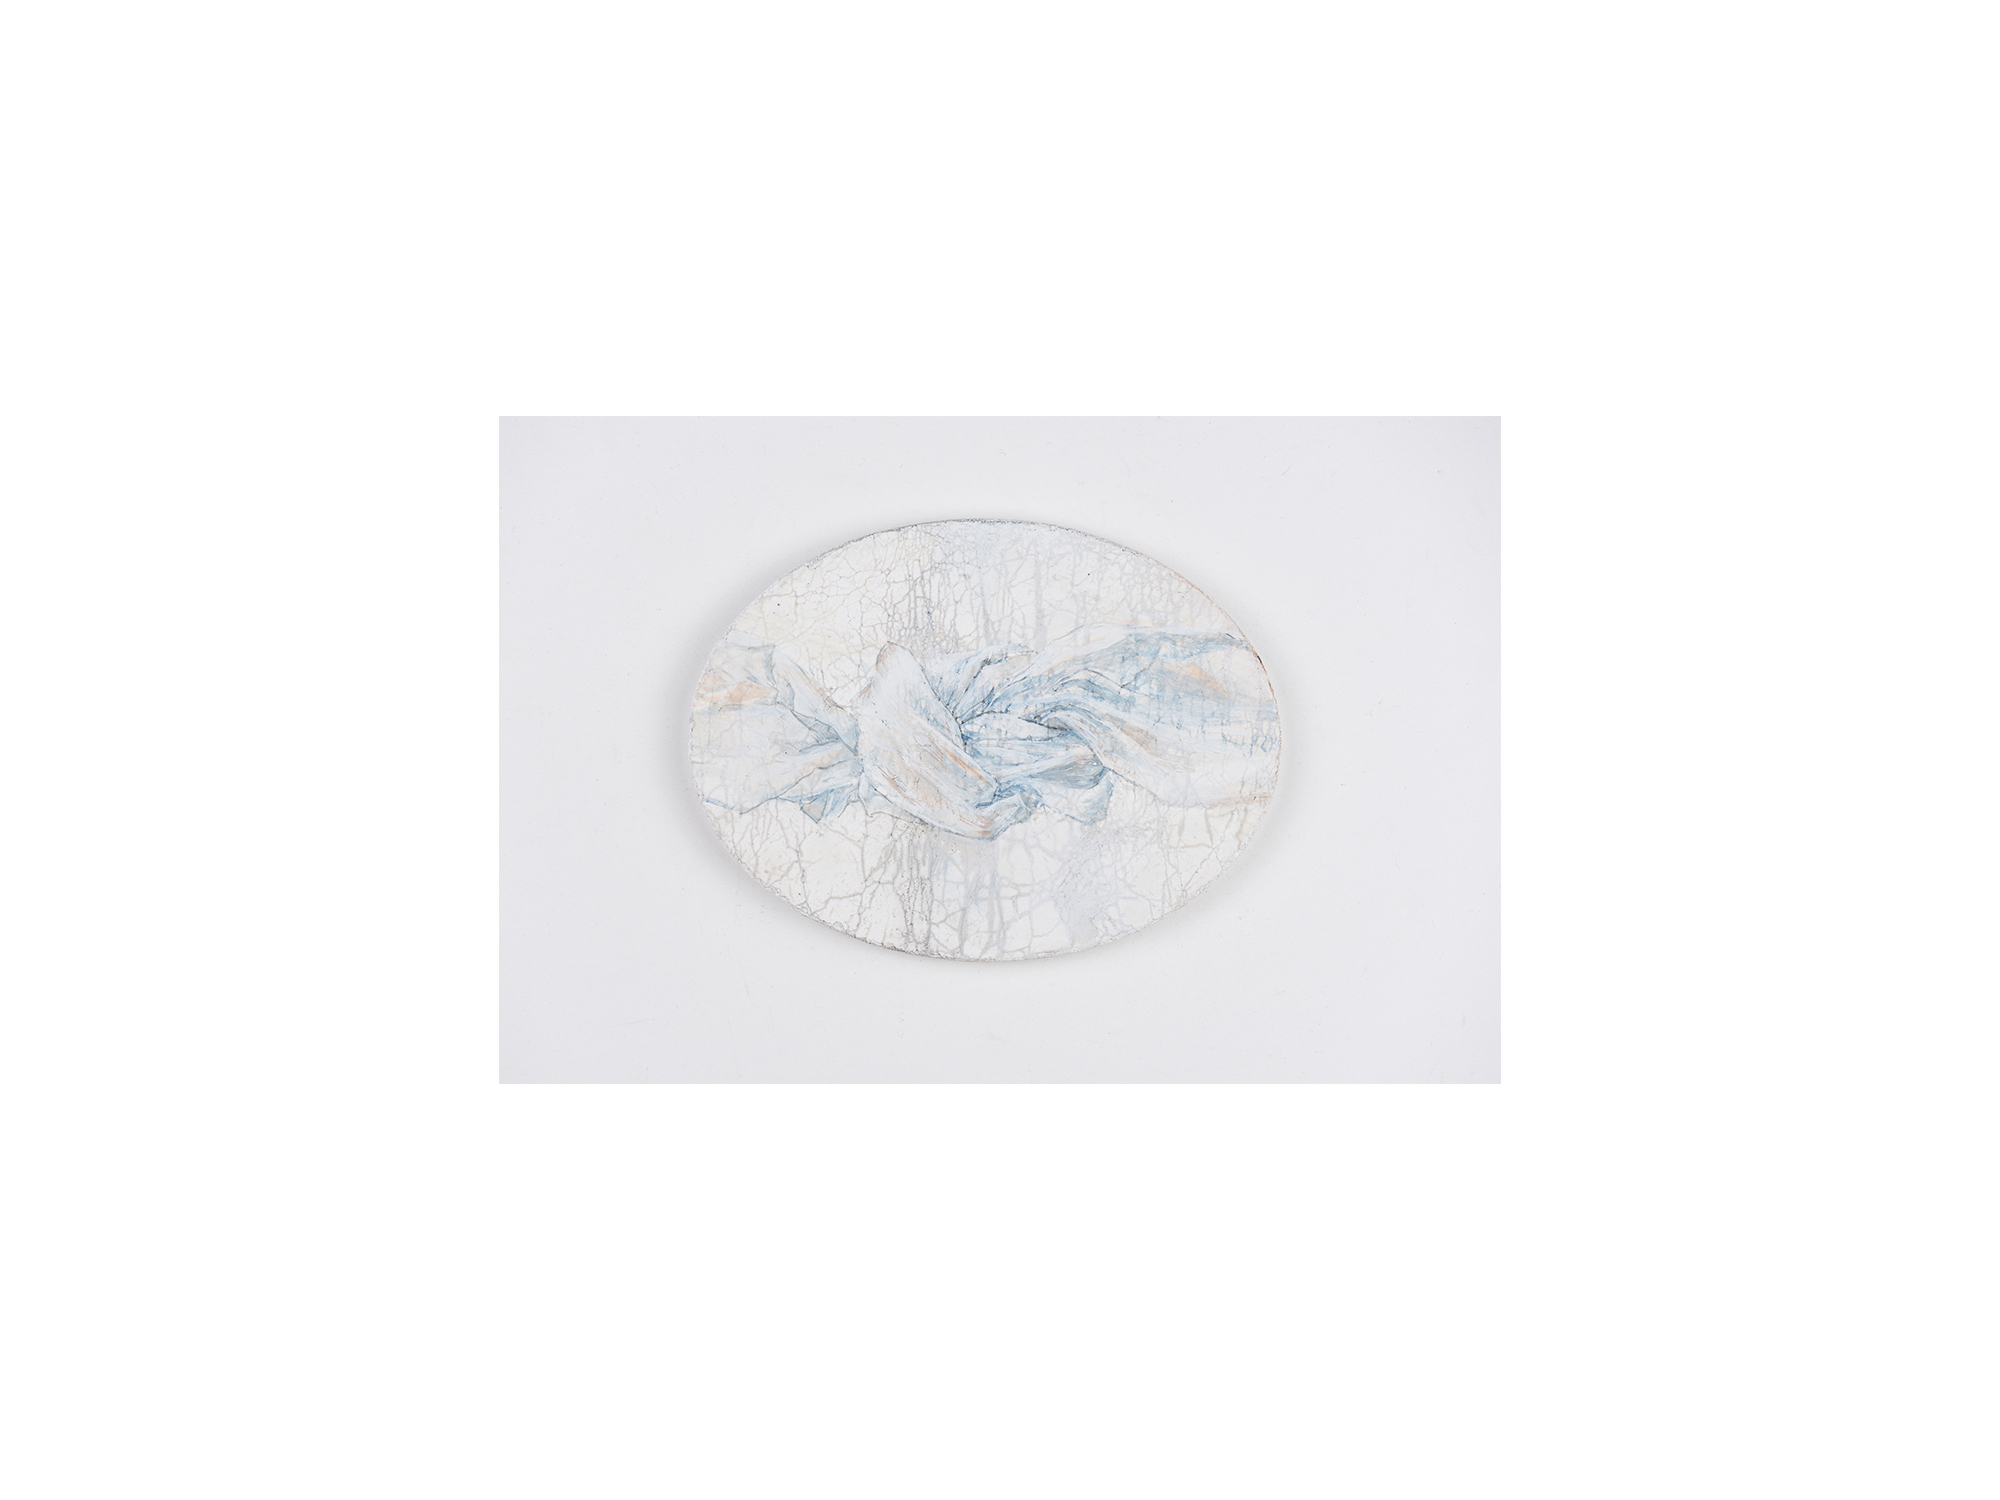 Sarah Tomasetti   Cloud Knot I , 2018 oil and encaustic on fresco plaster 13.5 x 18cm